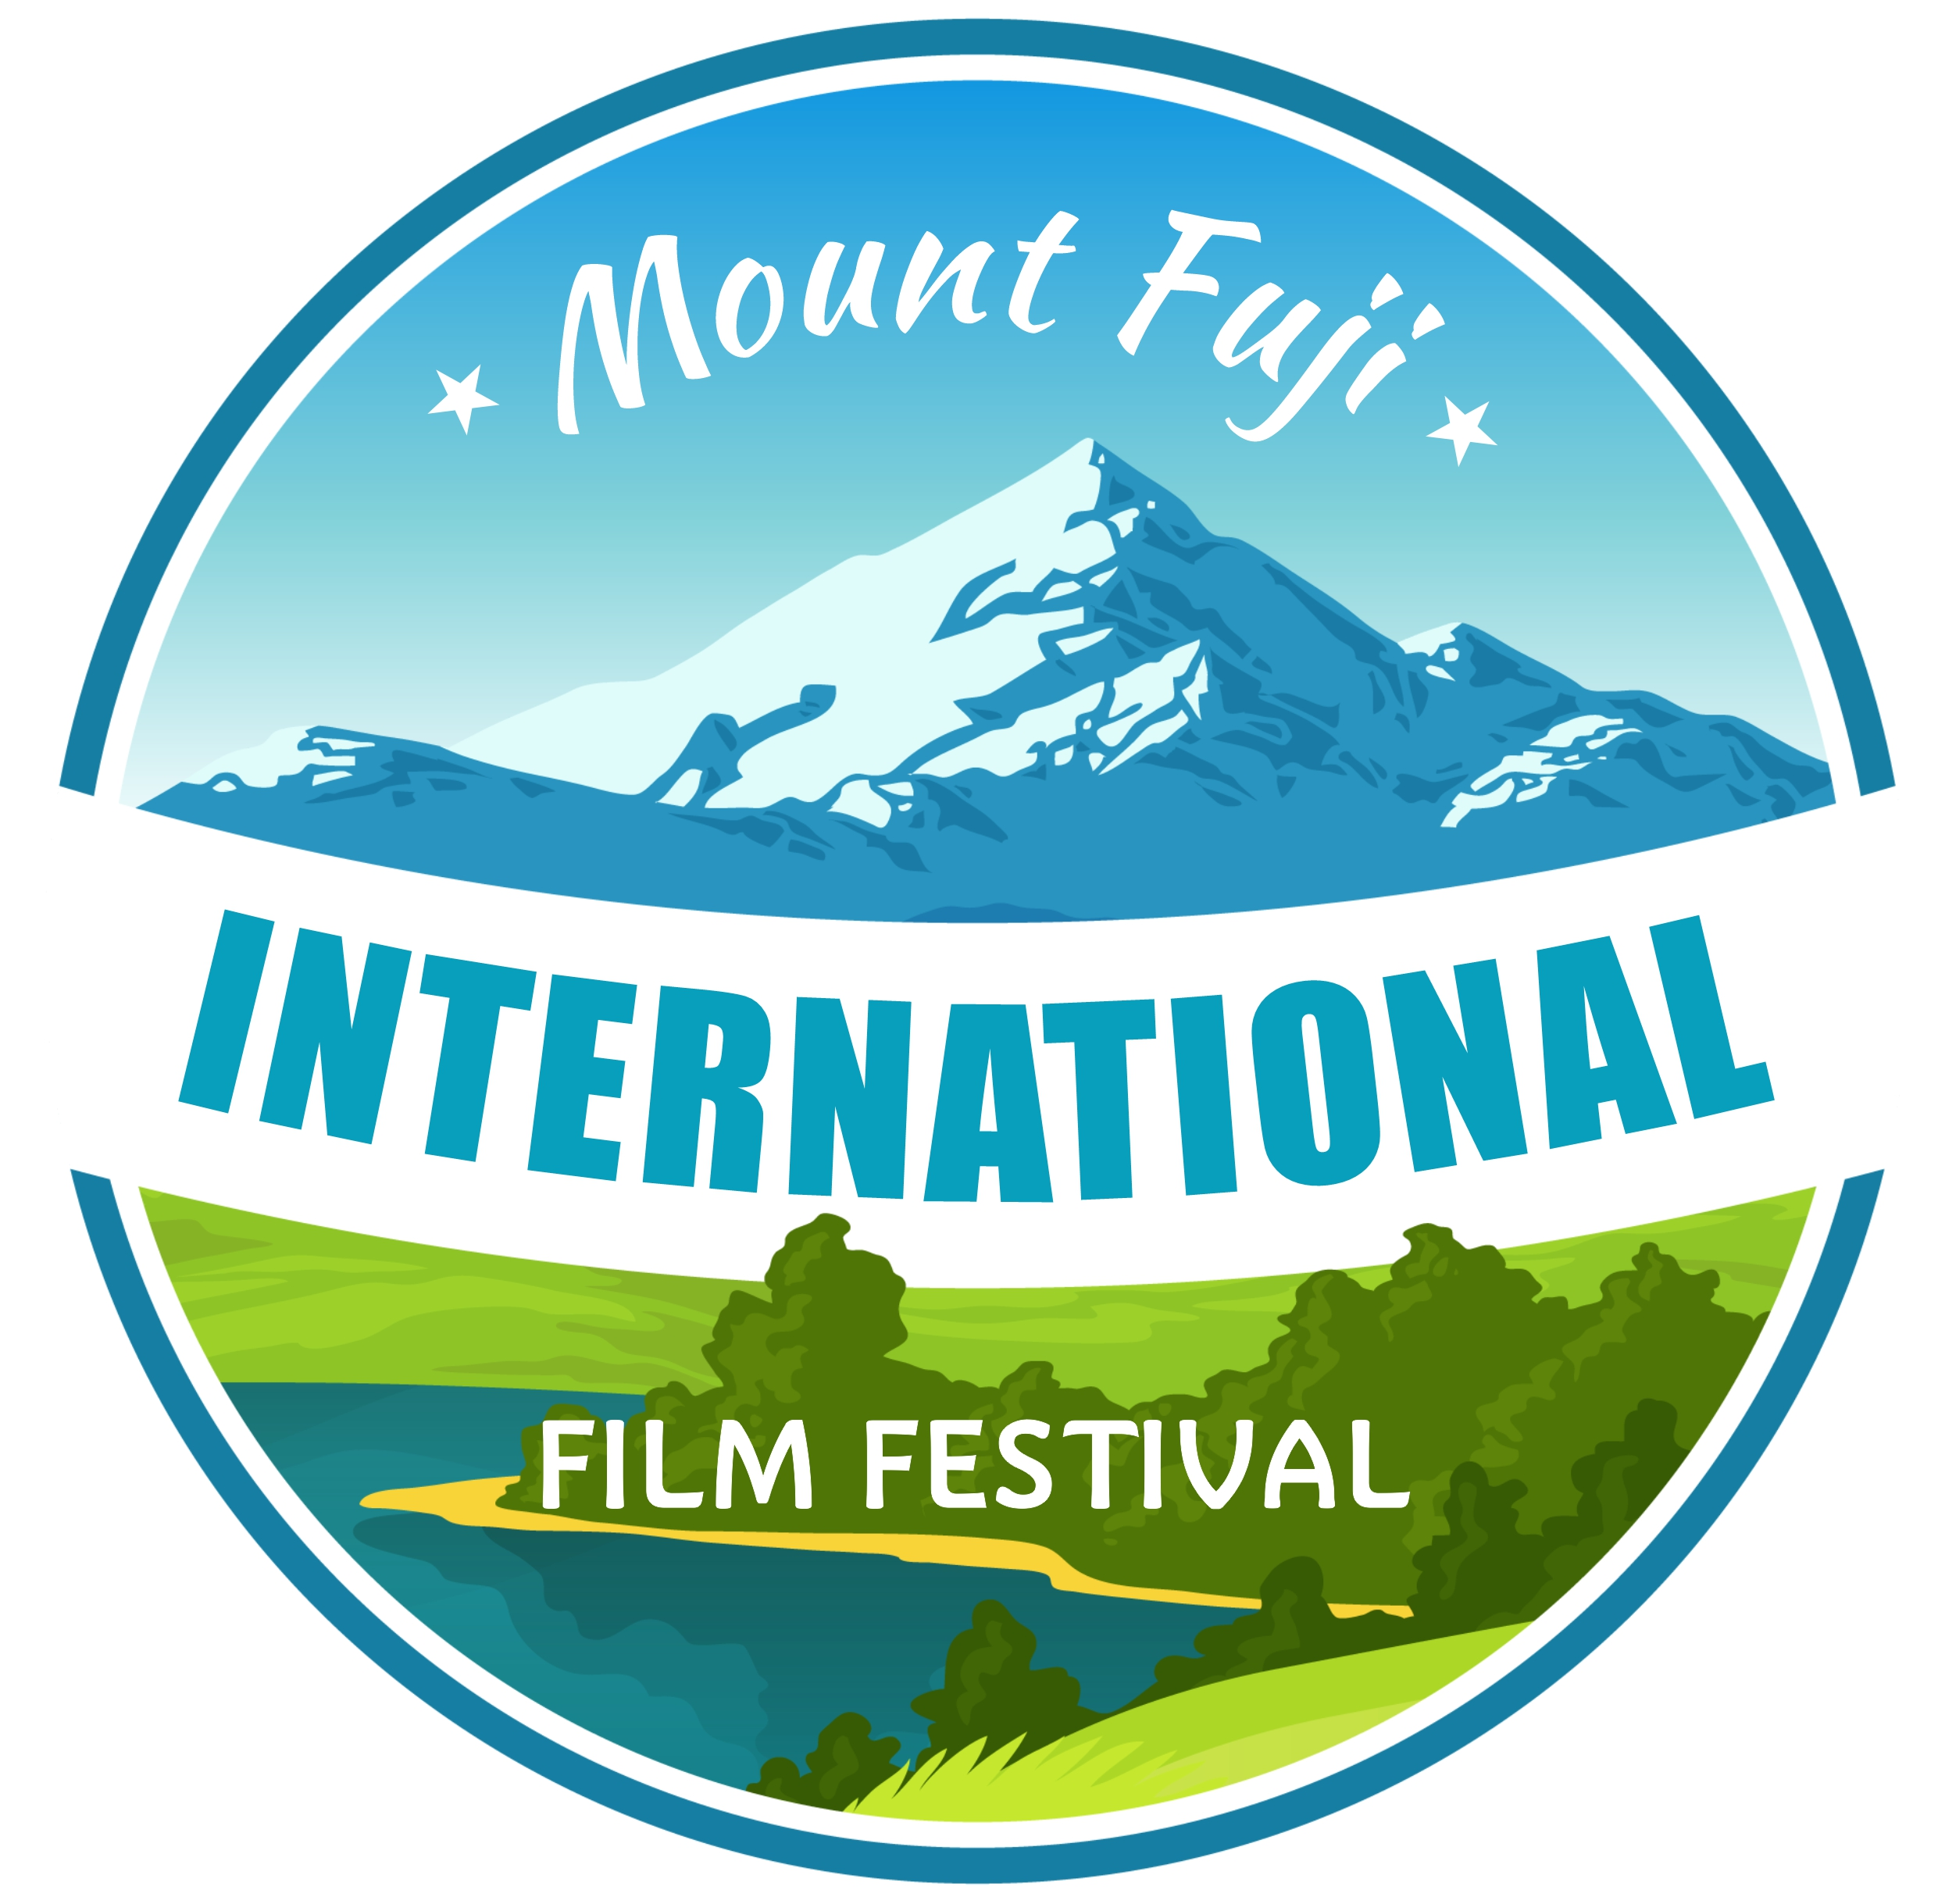 Mount Fuji International Film Festival